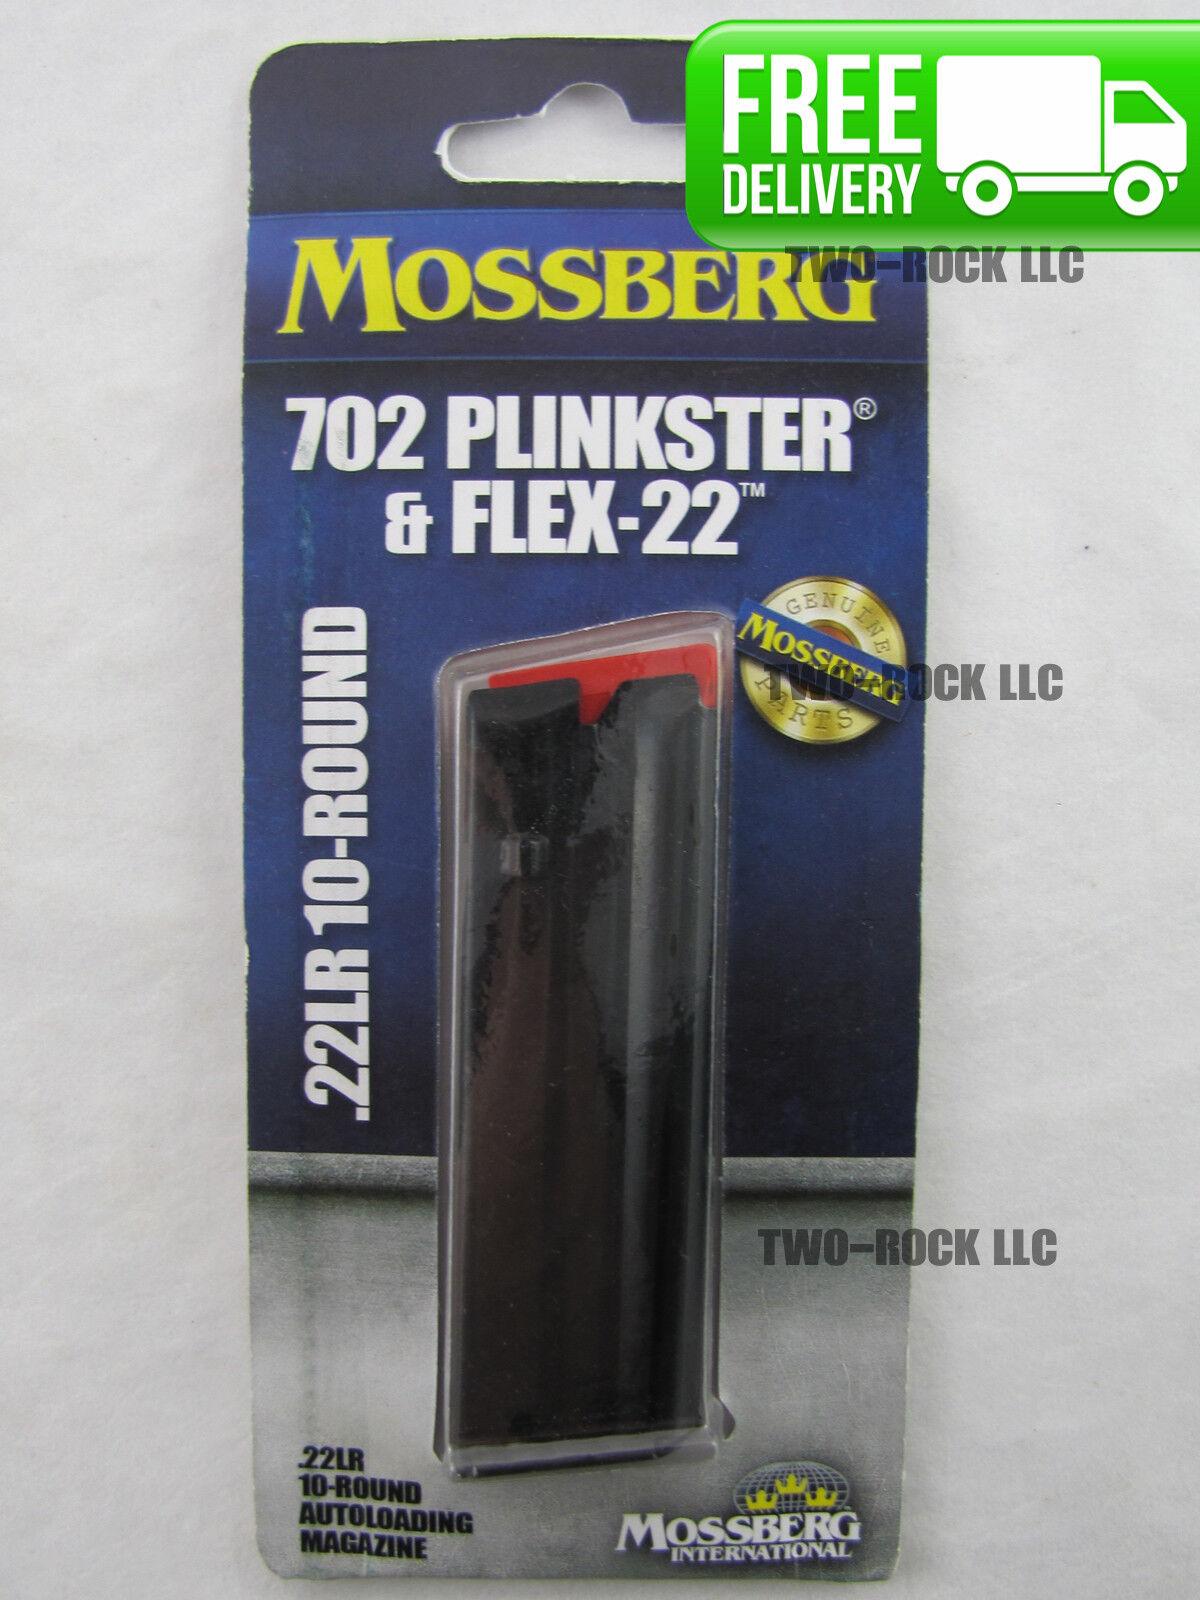 Mossberg International 702 Plinkster Magazine - 95702